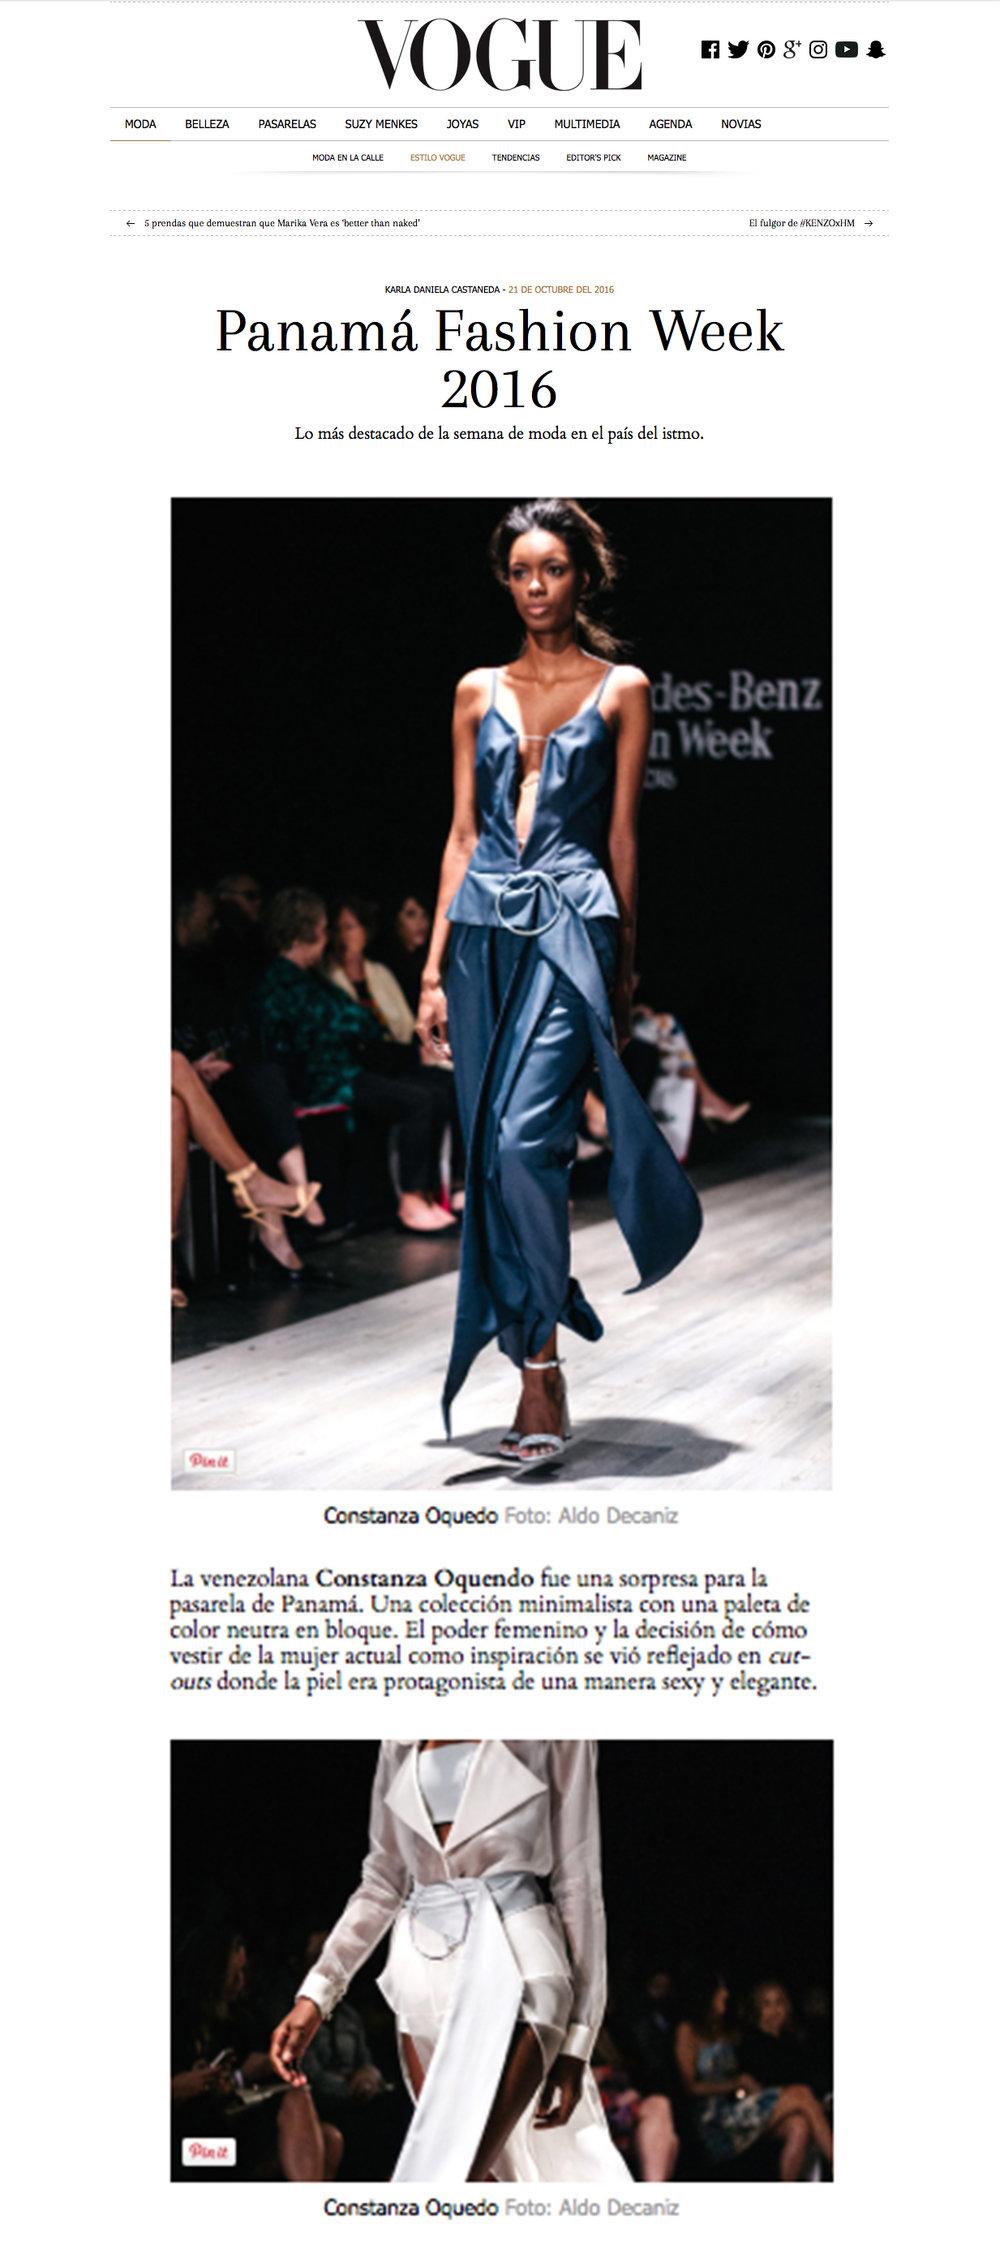 Vogue Mexico MBFWP.jpg